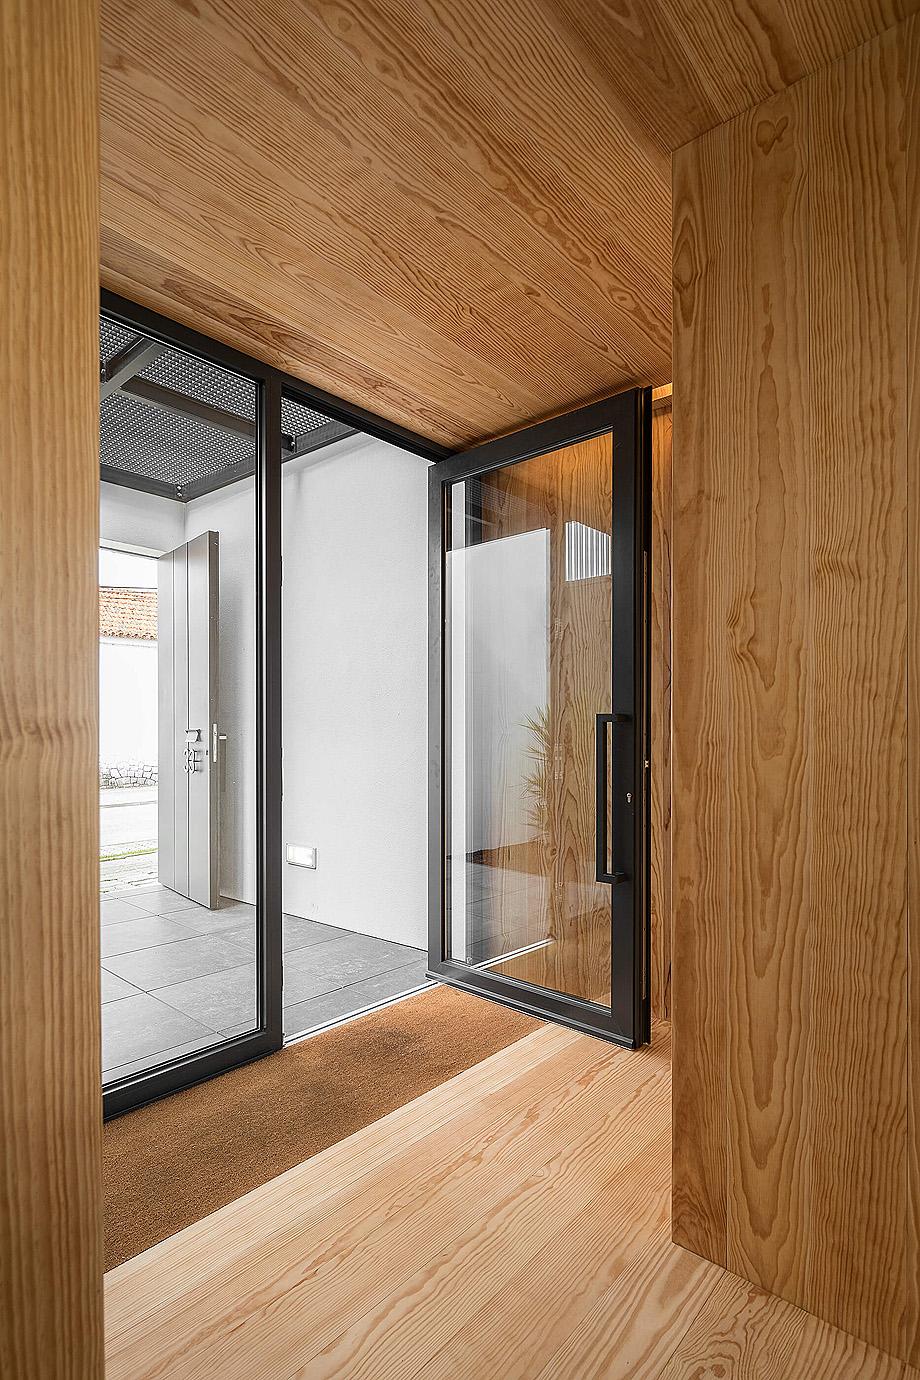 casa do arco de frari architecture network - foto ivo tavares (19)